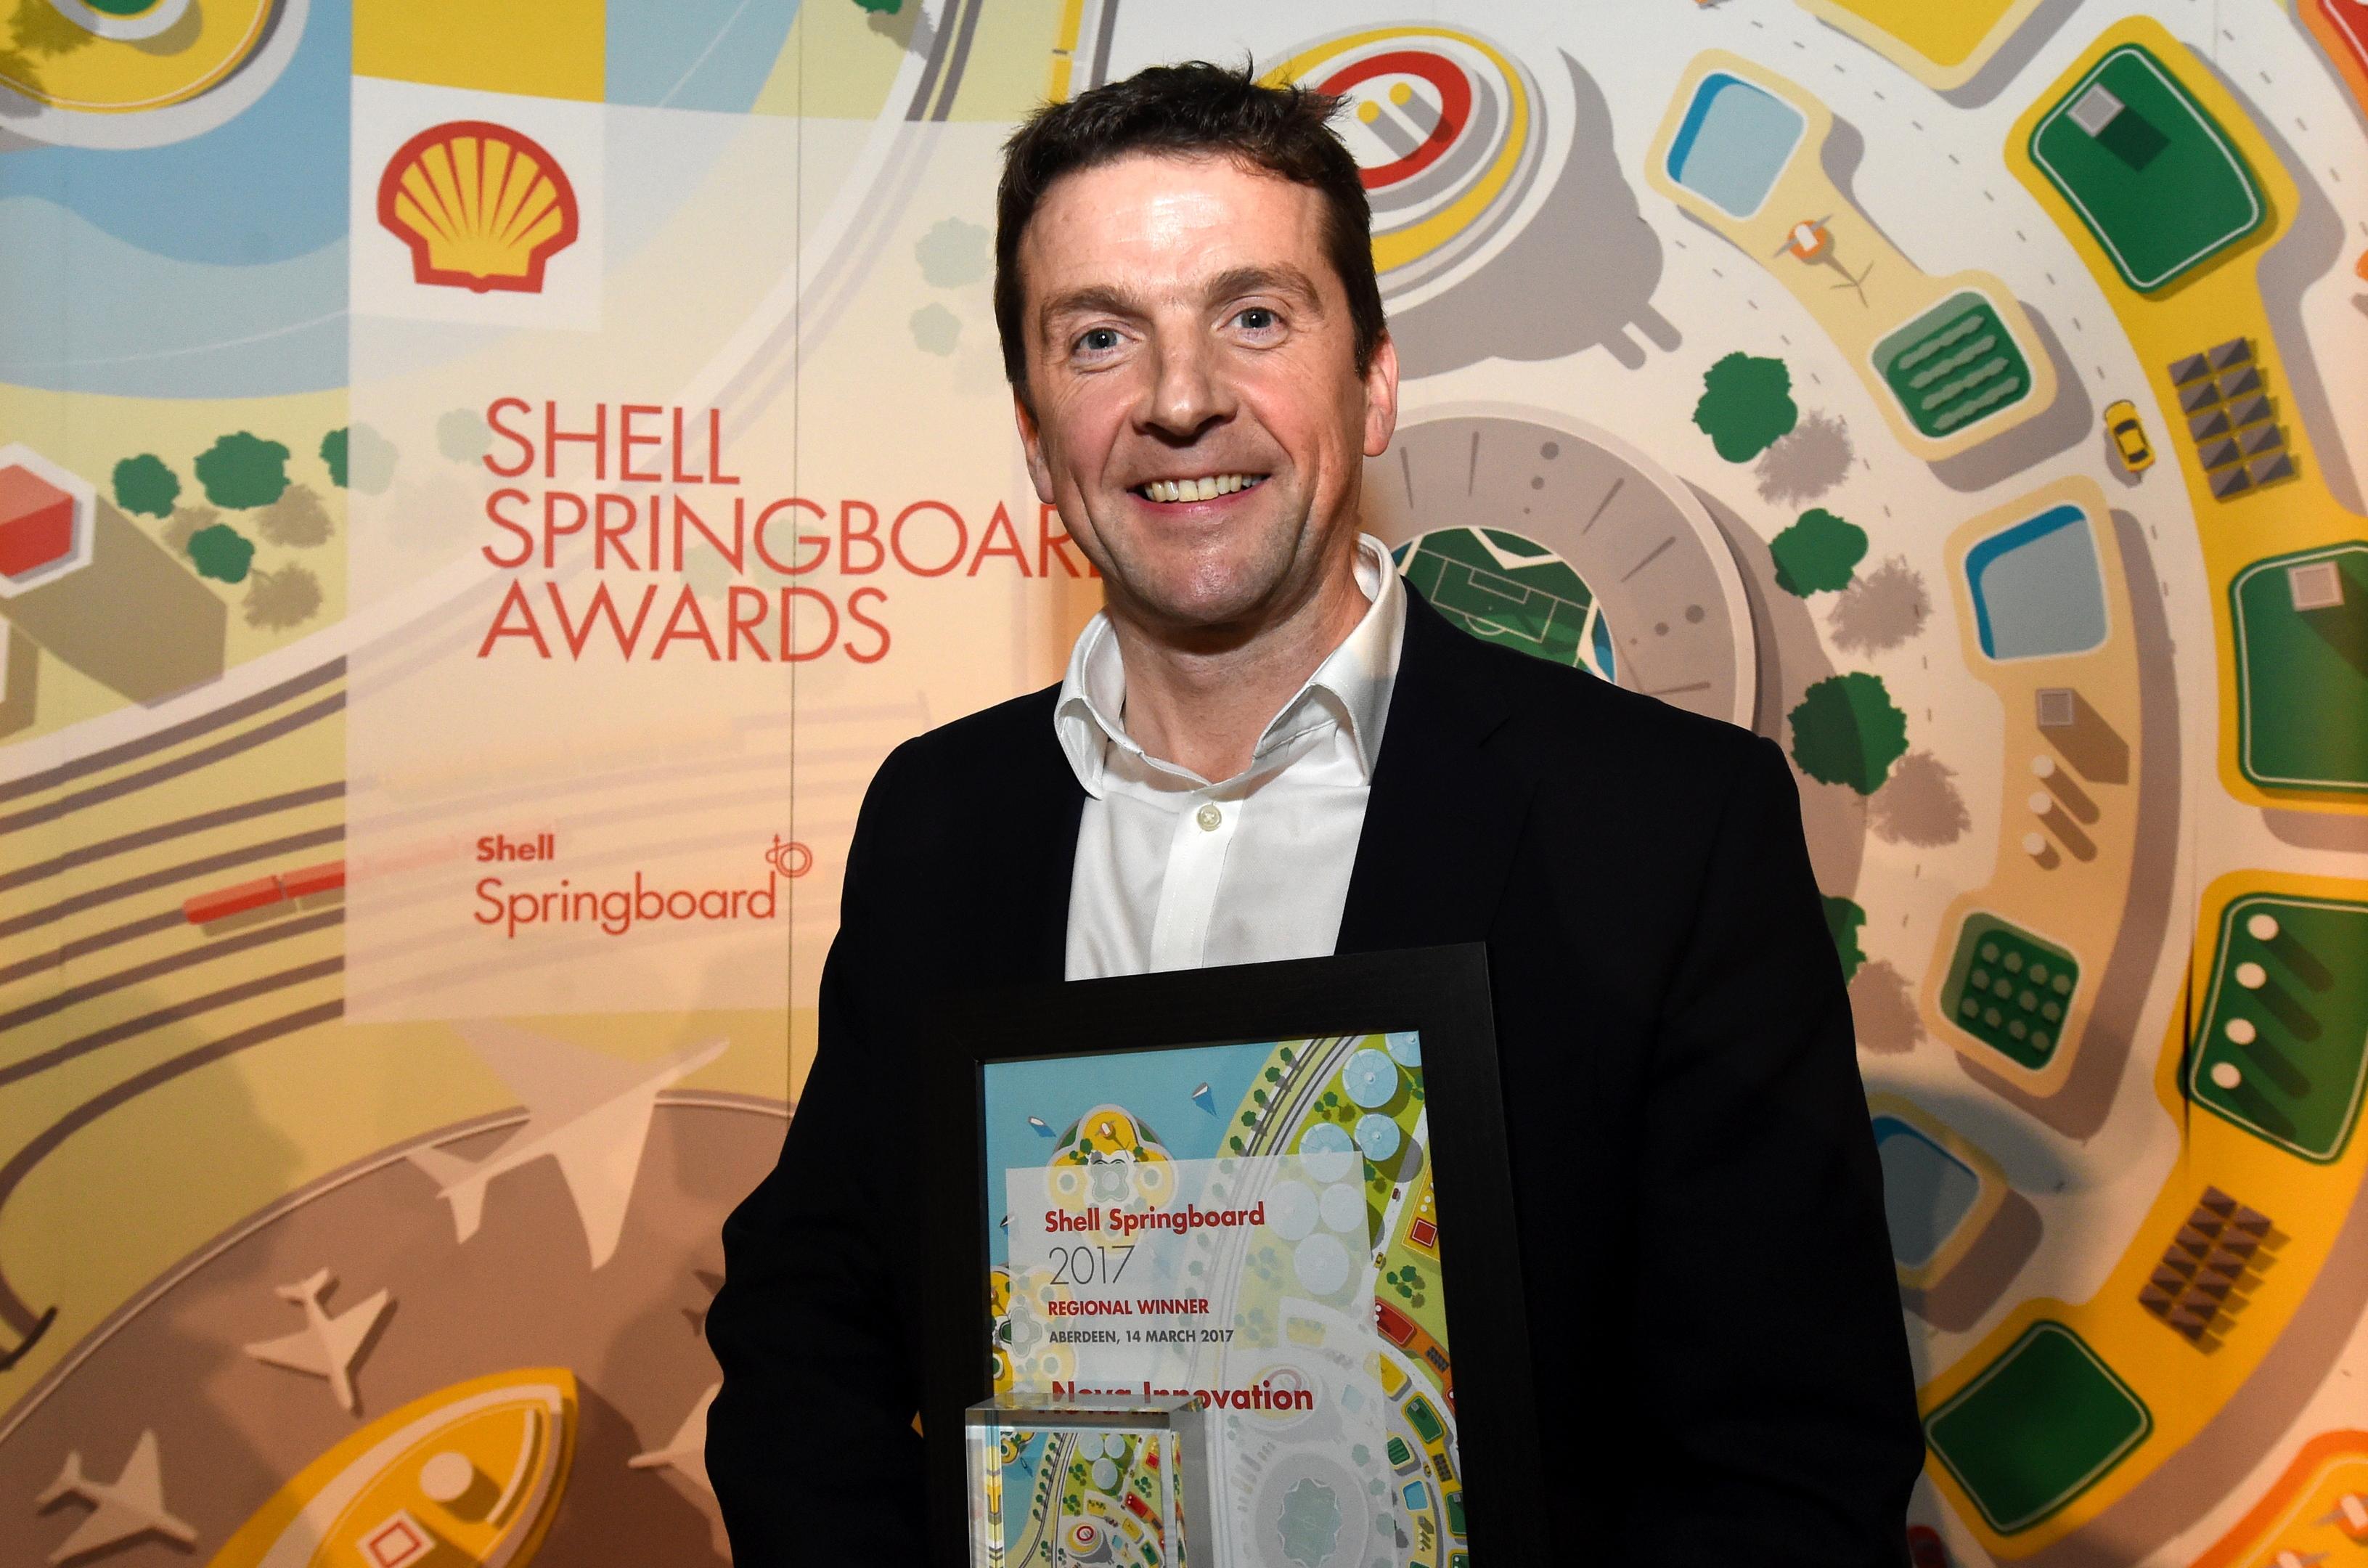 Simon Forrest, CEO Nova Innovation